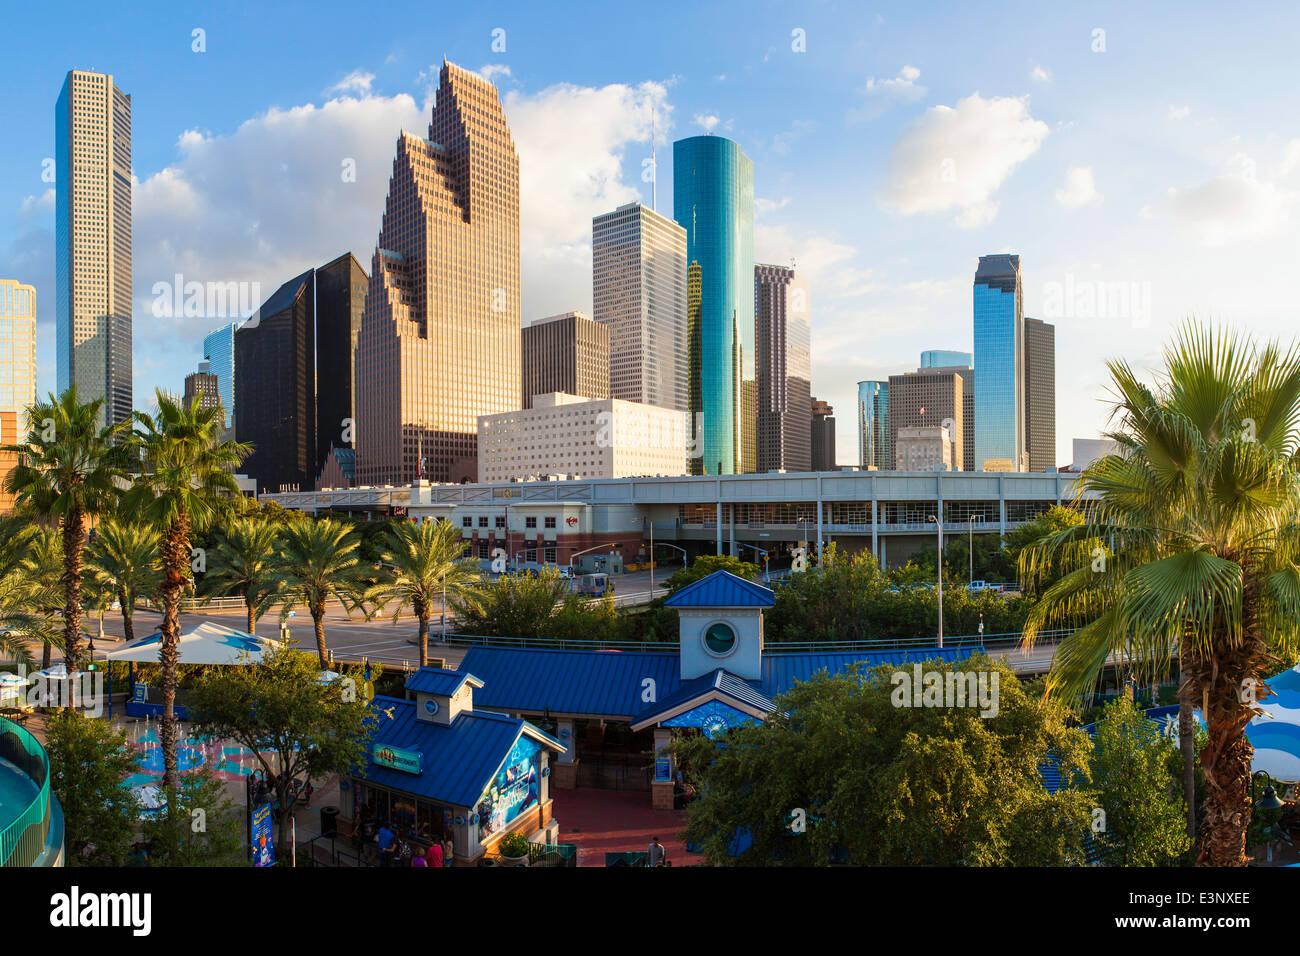 City skyline, Houston, Texas, United States of America - Stock Image